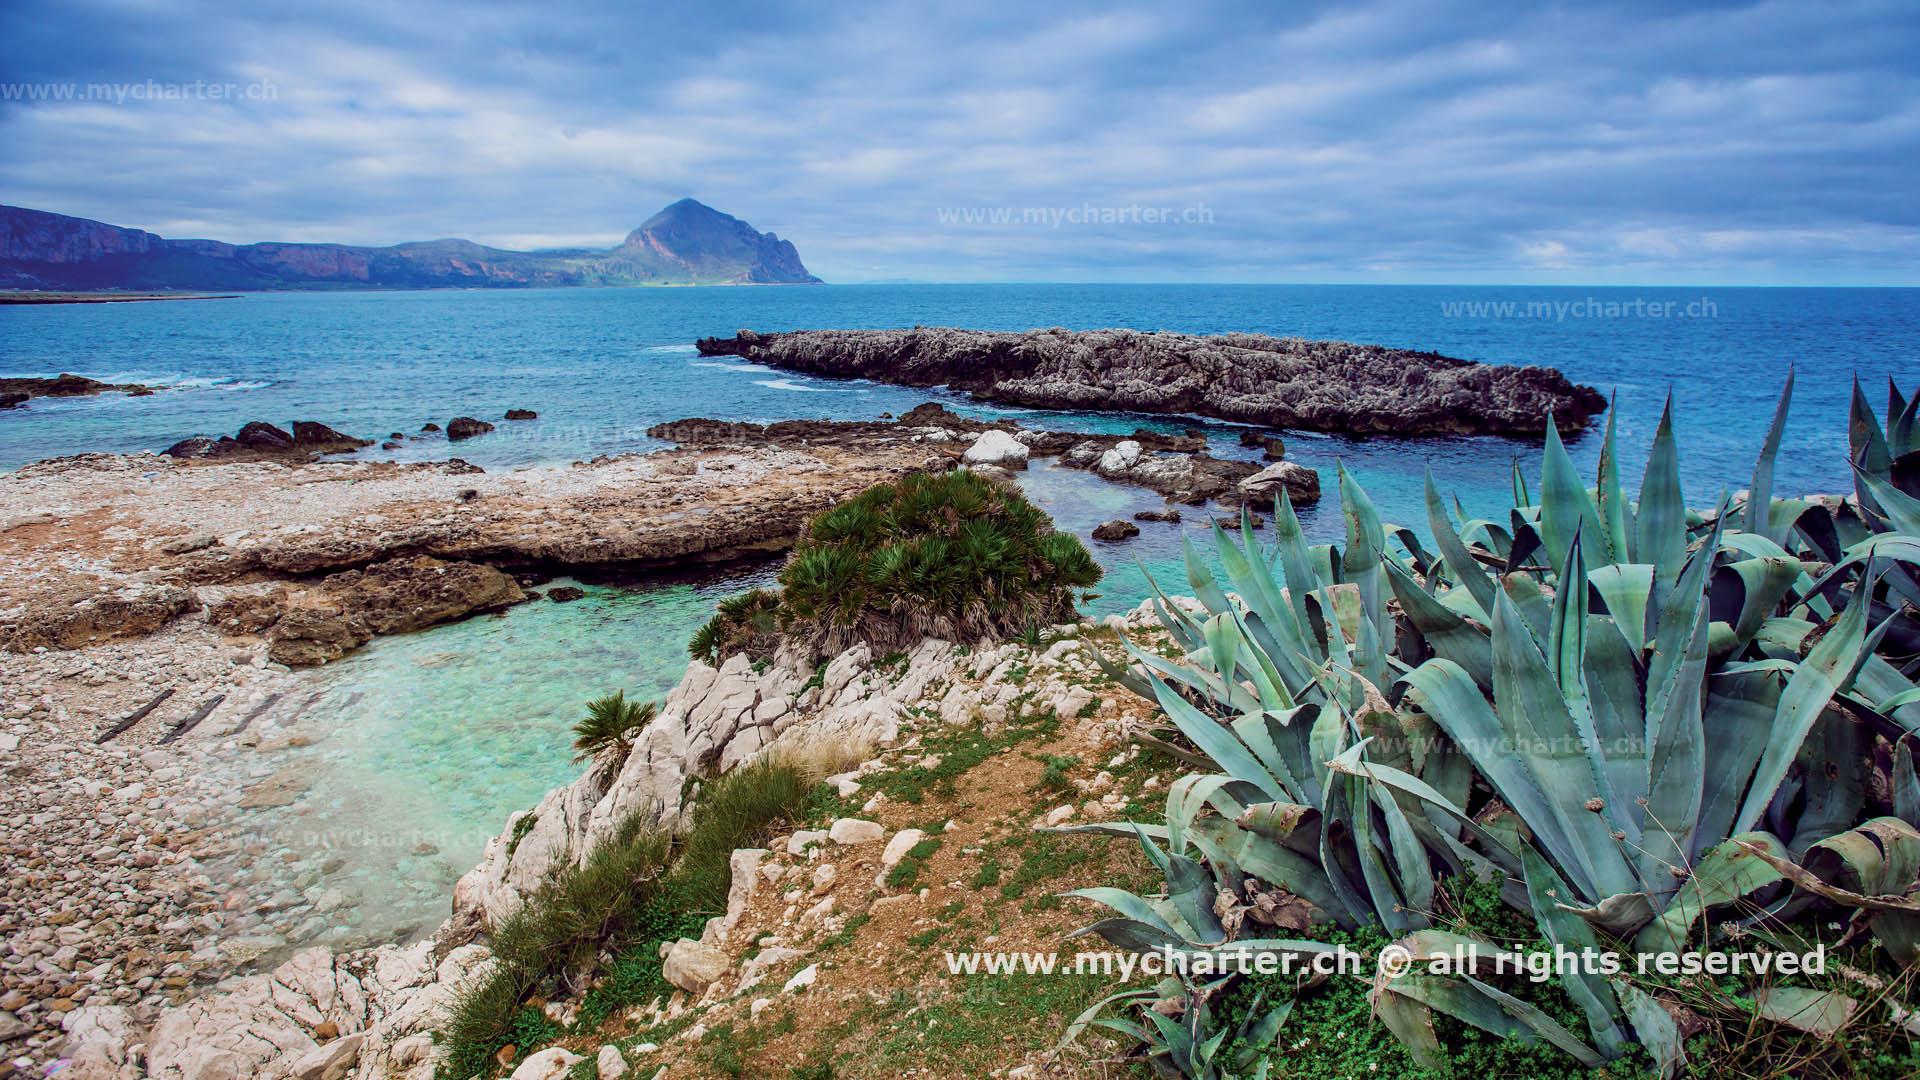 Sizilien - Capo Milazzo